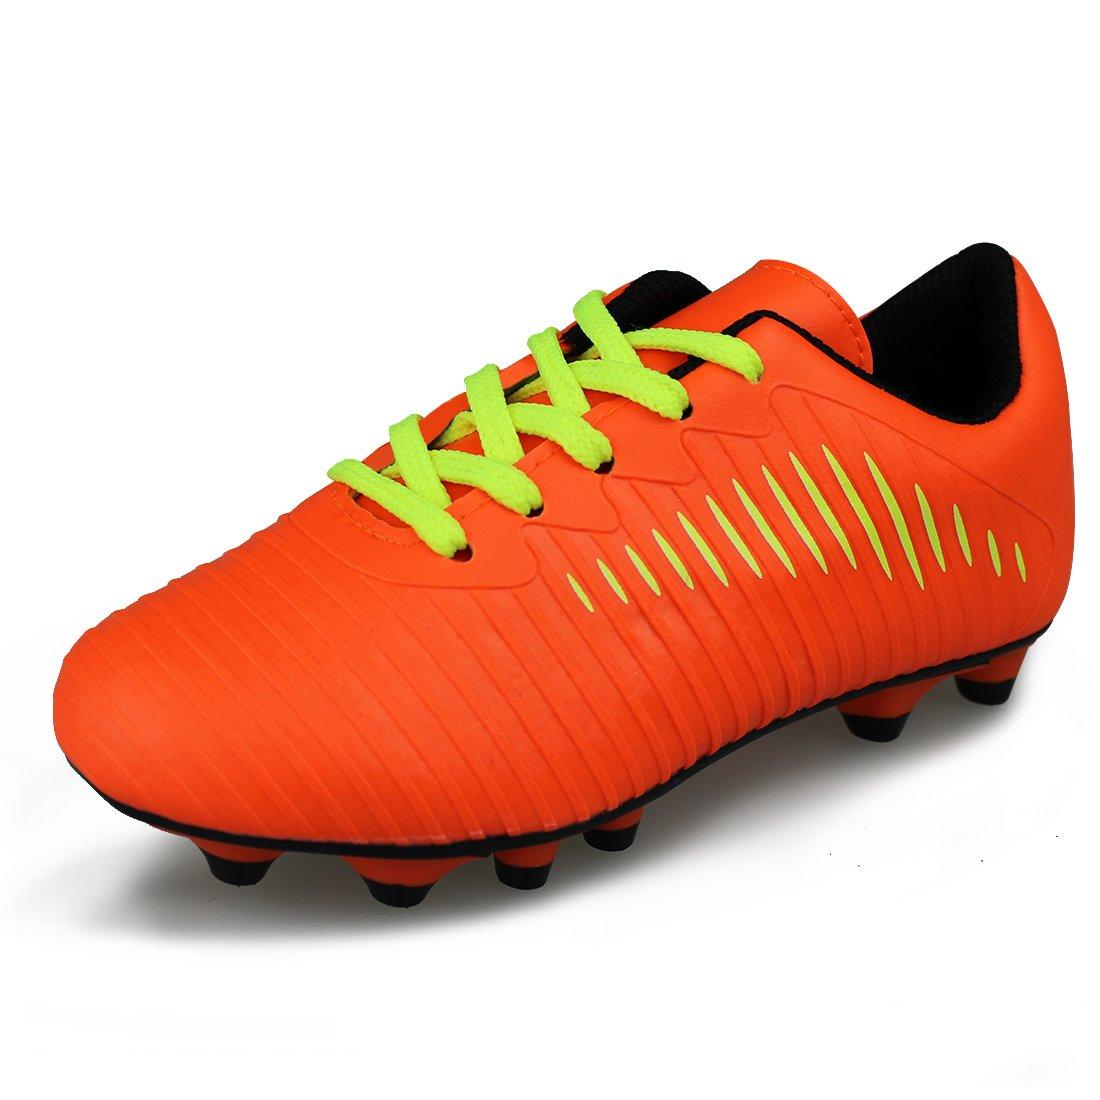 Hawkwell Comfortable Soccer Shoes(Toddler/Little Kid/Big Kid),Orange PU,11.5 M US